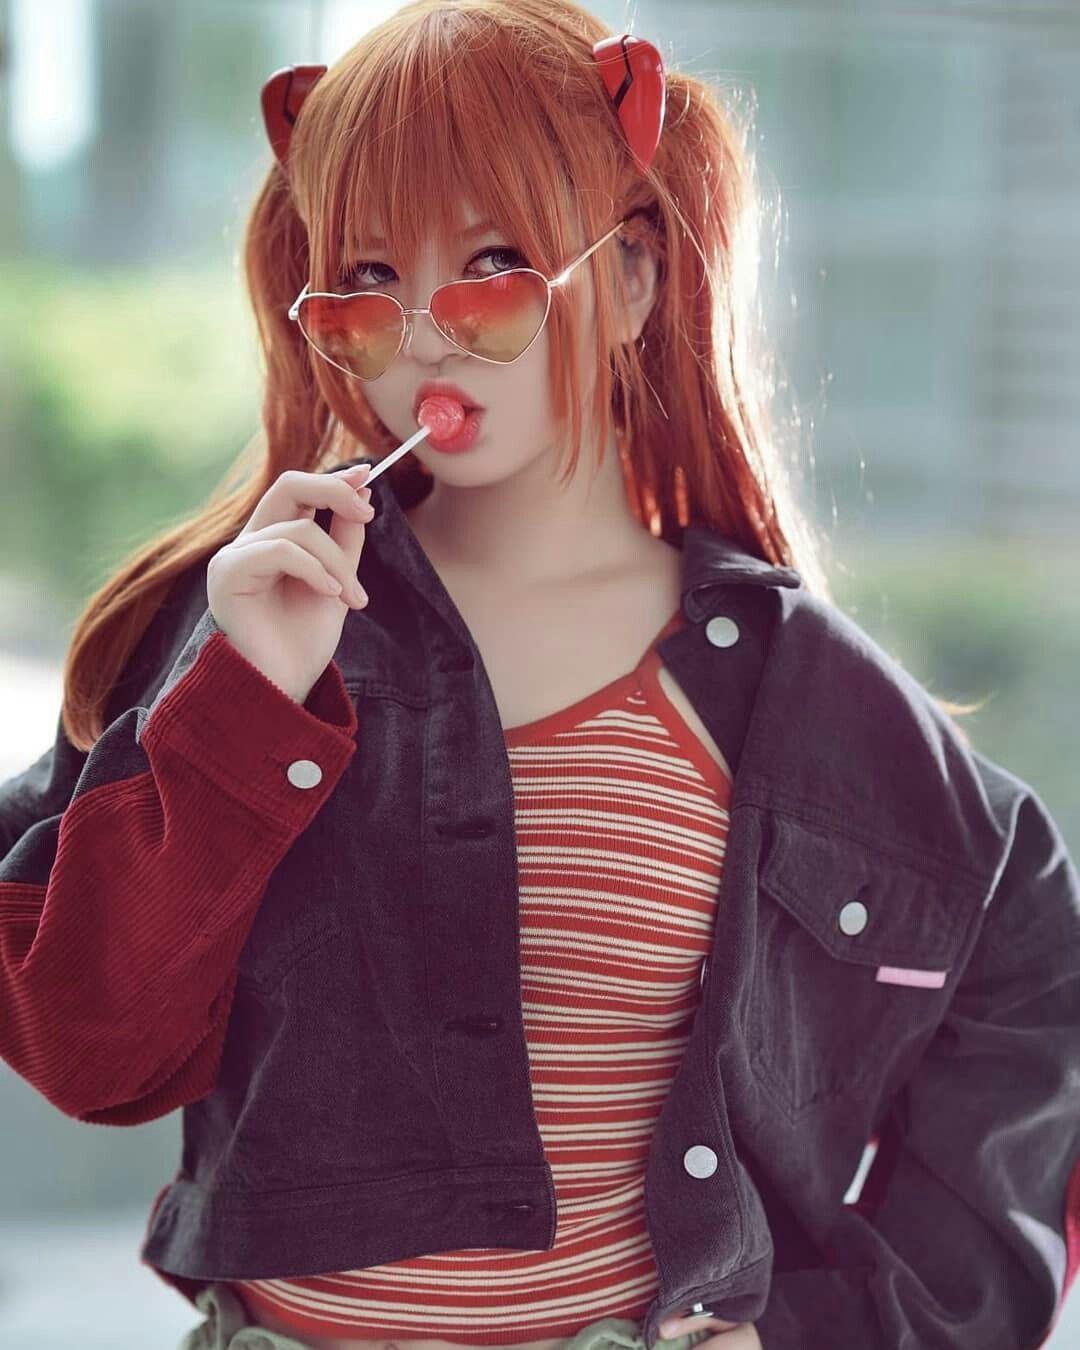 Anime Evangelion Asuka Langley Soryu Japan Anime Jacket Coat cos